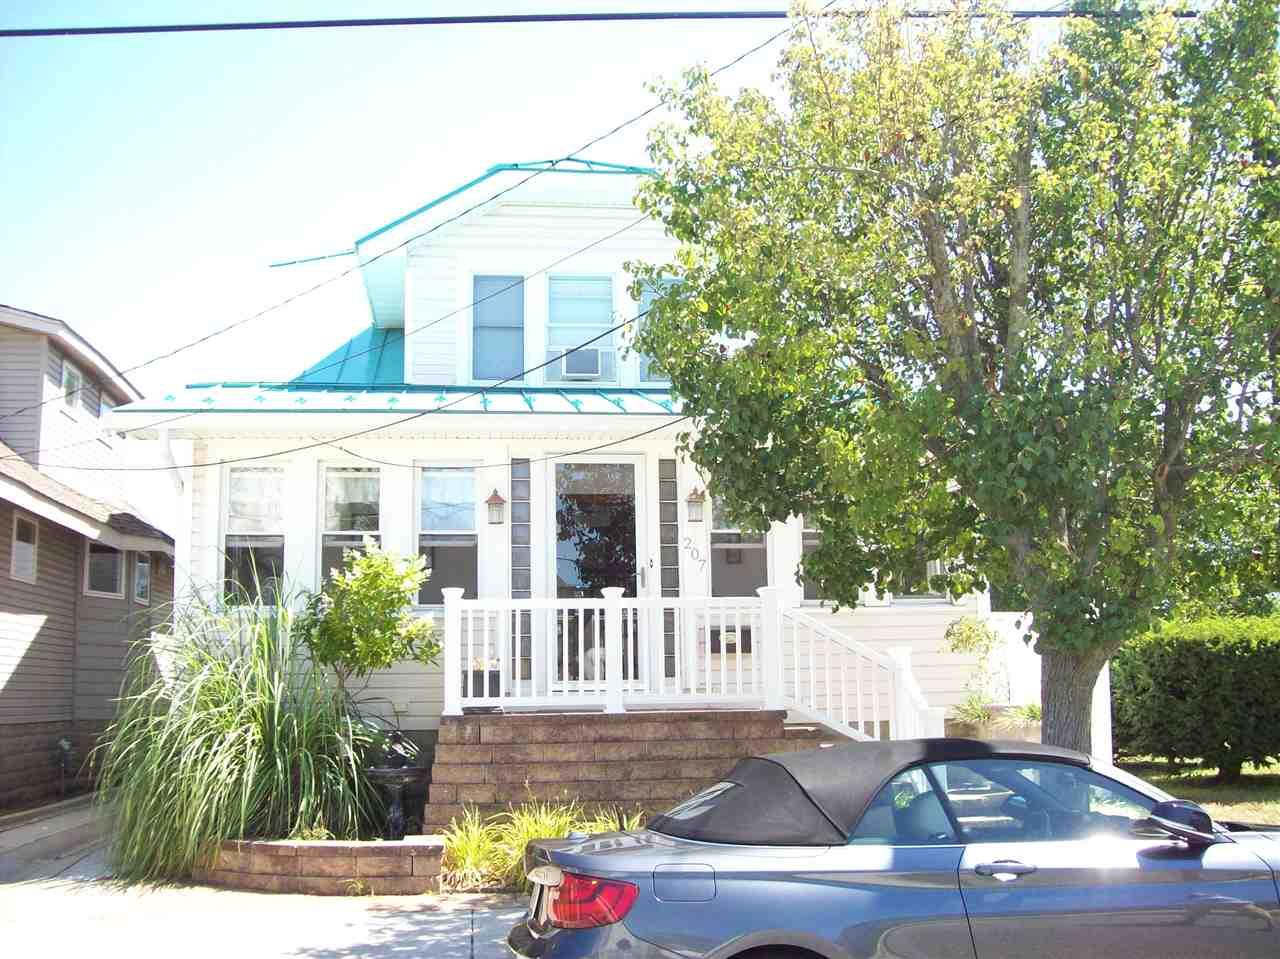 207 W Poplar, Wildwood, NJ 08260